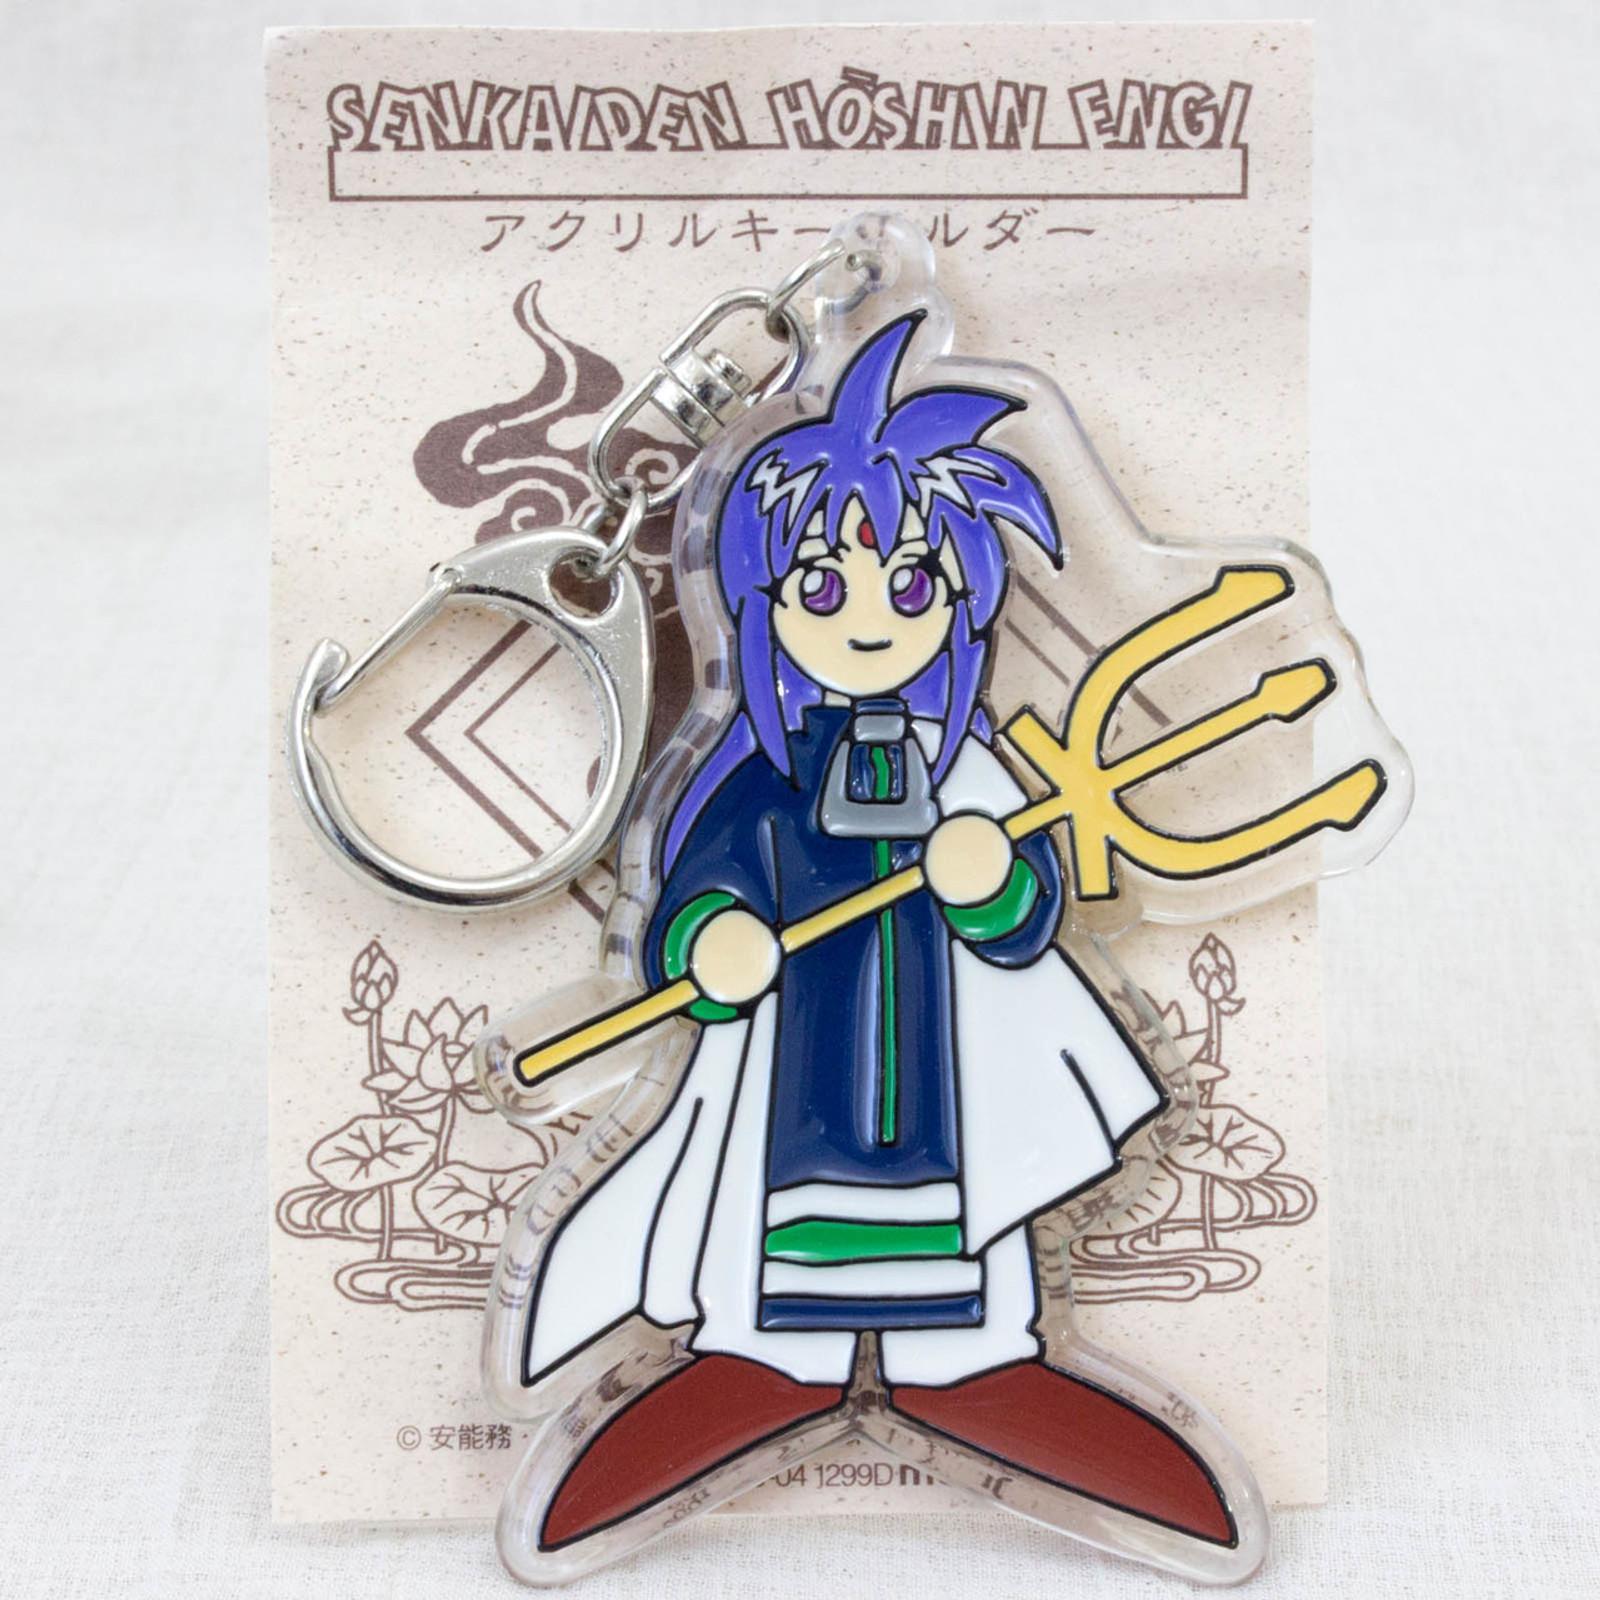 Senkaiden Hoshin Engi Youzen Acrylic Mascot Key Chain JAPAN ANIME MANGA